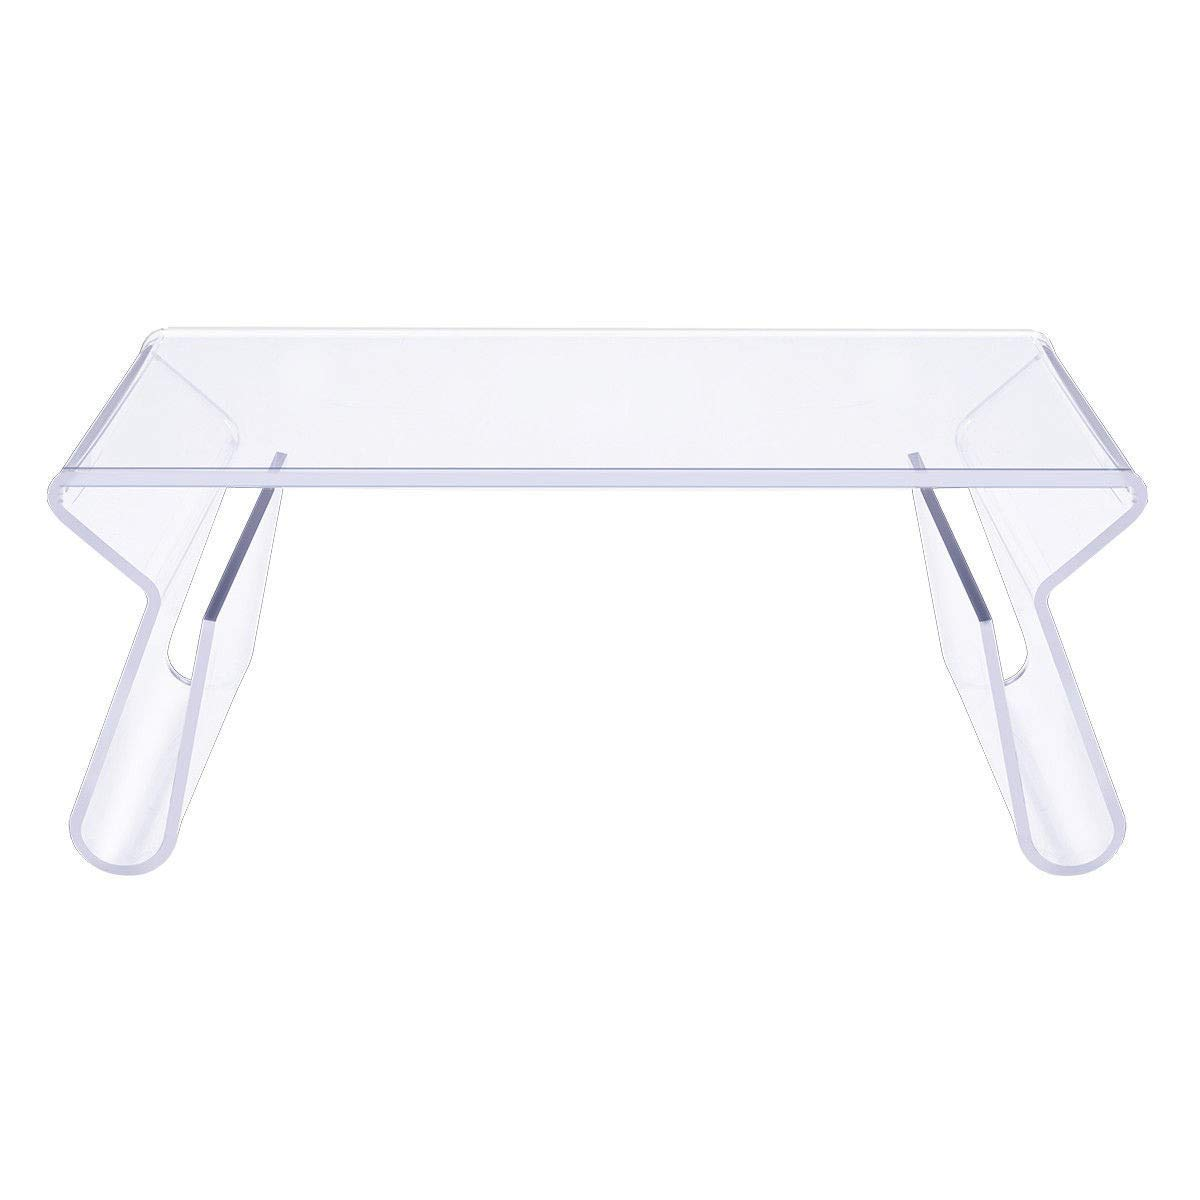 Cheap Acrylic Coffee Table Ikea Find Acrylic Coffee Table Ikea Deals On Line At Alibaba Com